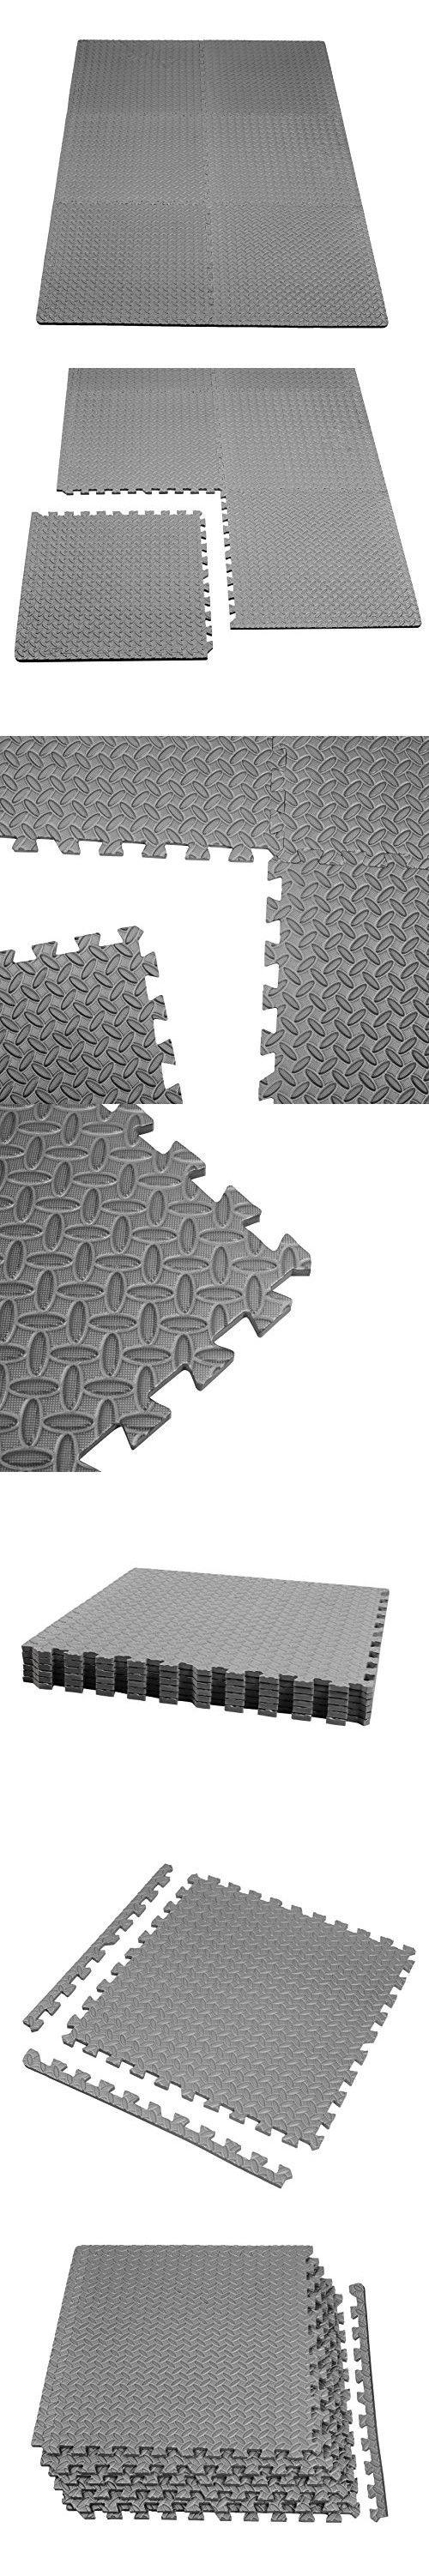 Rubber floor mats for basement - Gloue Puzzle Exercise Mat Eva Interlocking Floor Mat Set For 24 Square Anti Fatigue Exercise